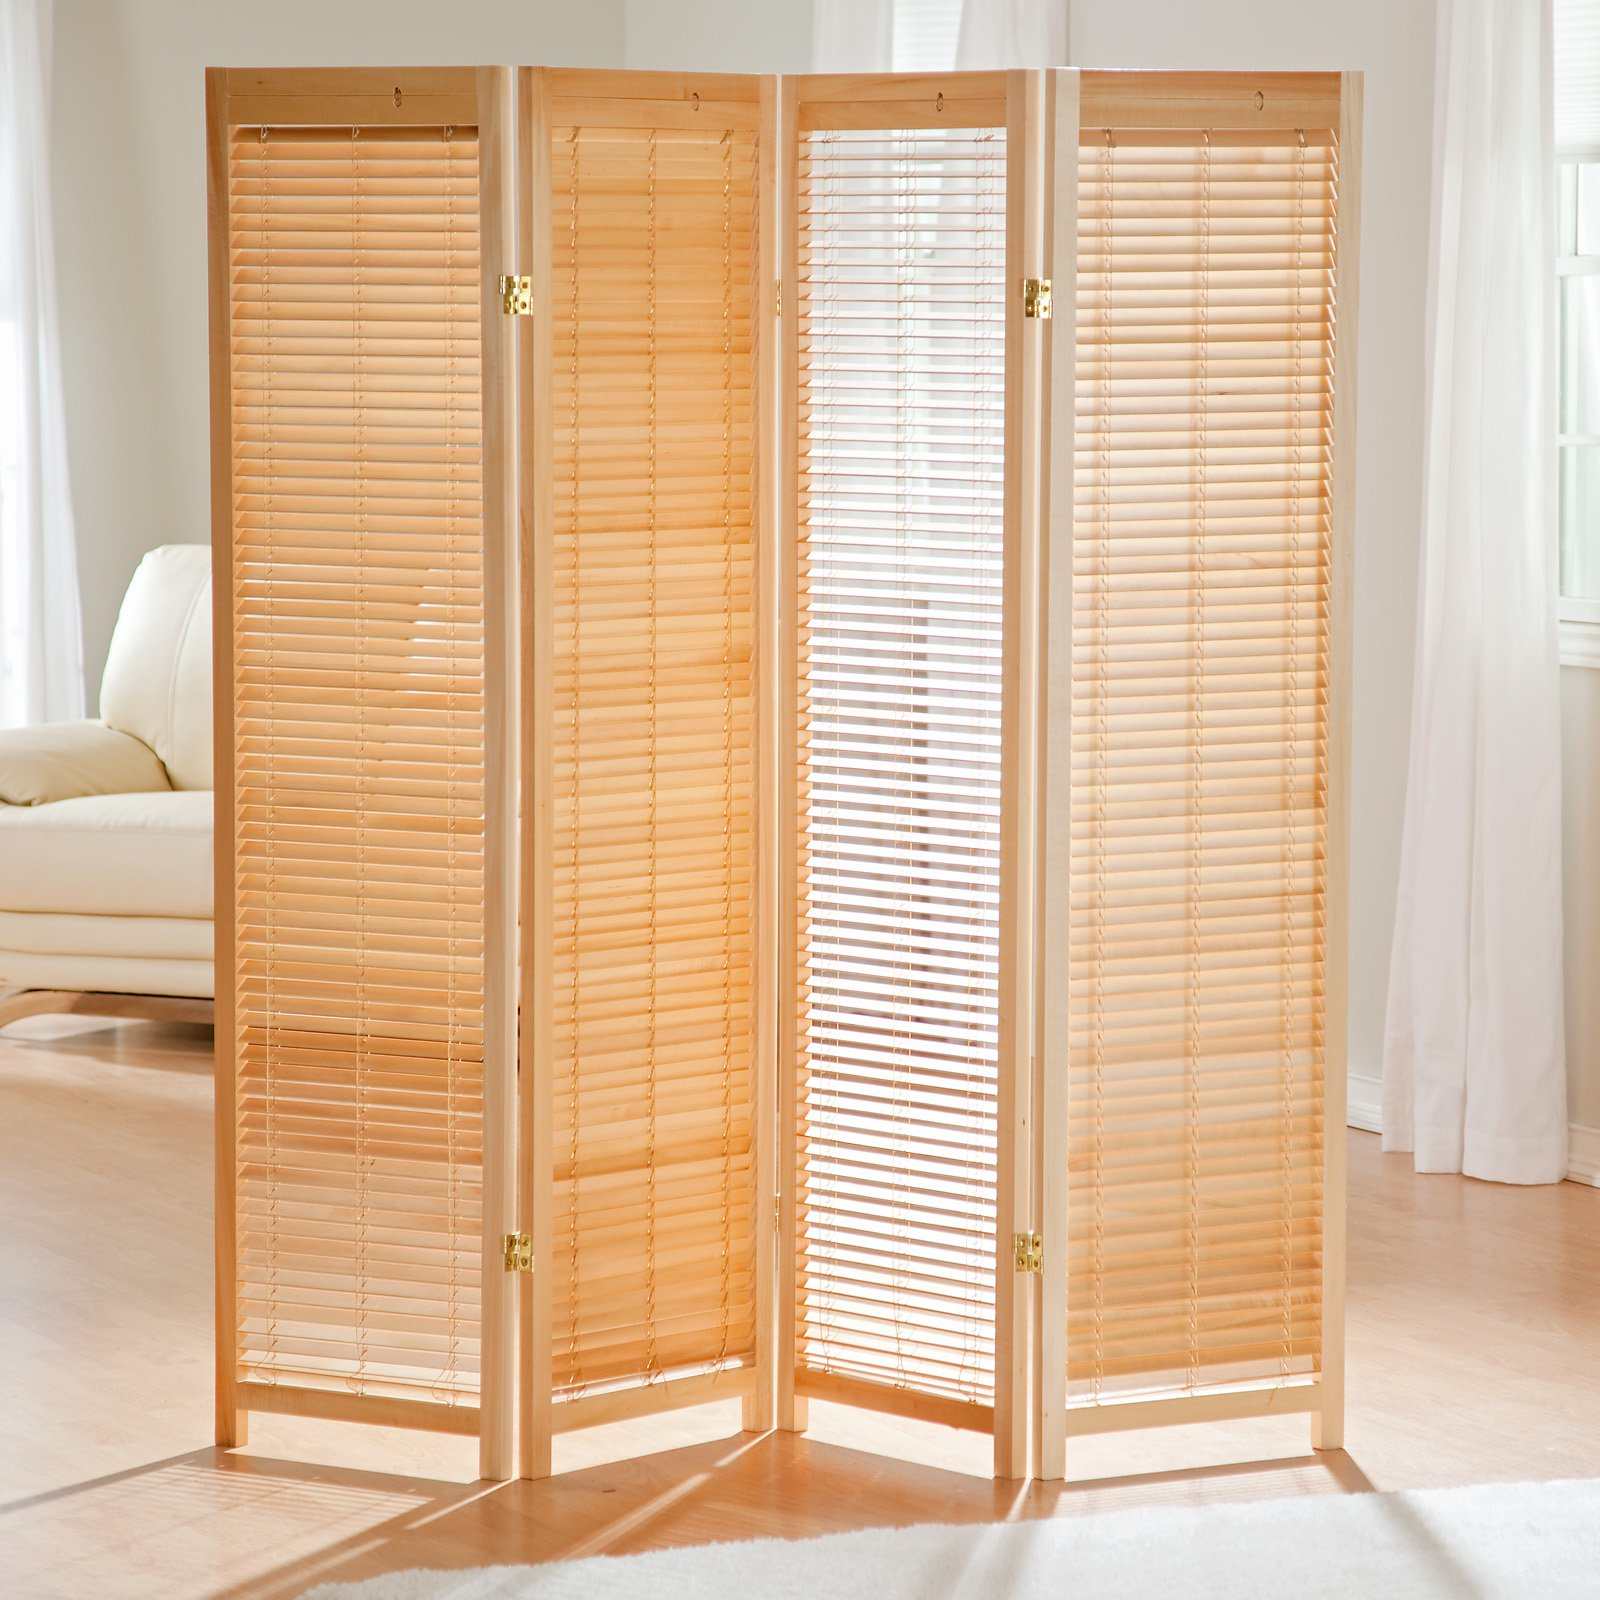 tranquility wooden shutter room divider - walmart